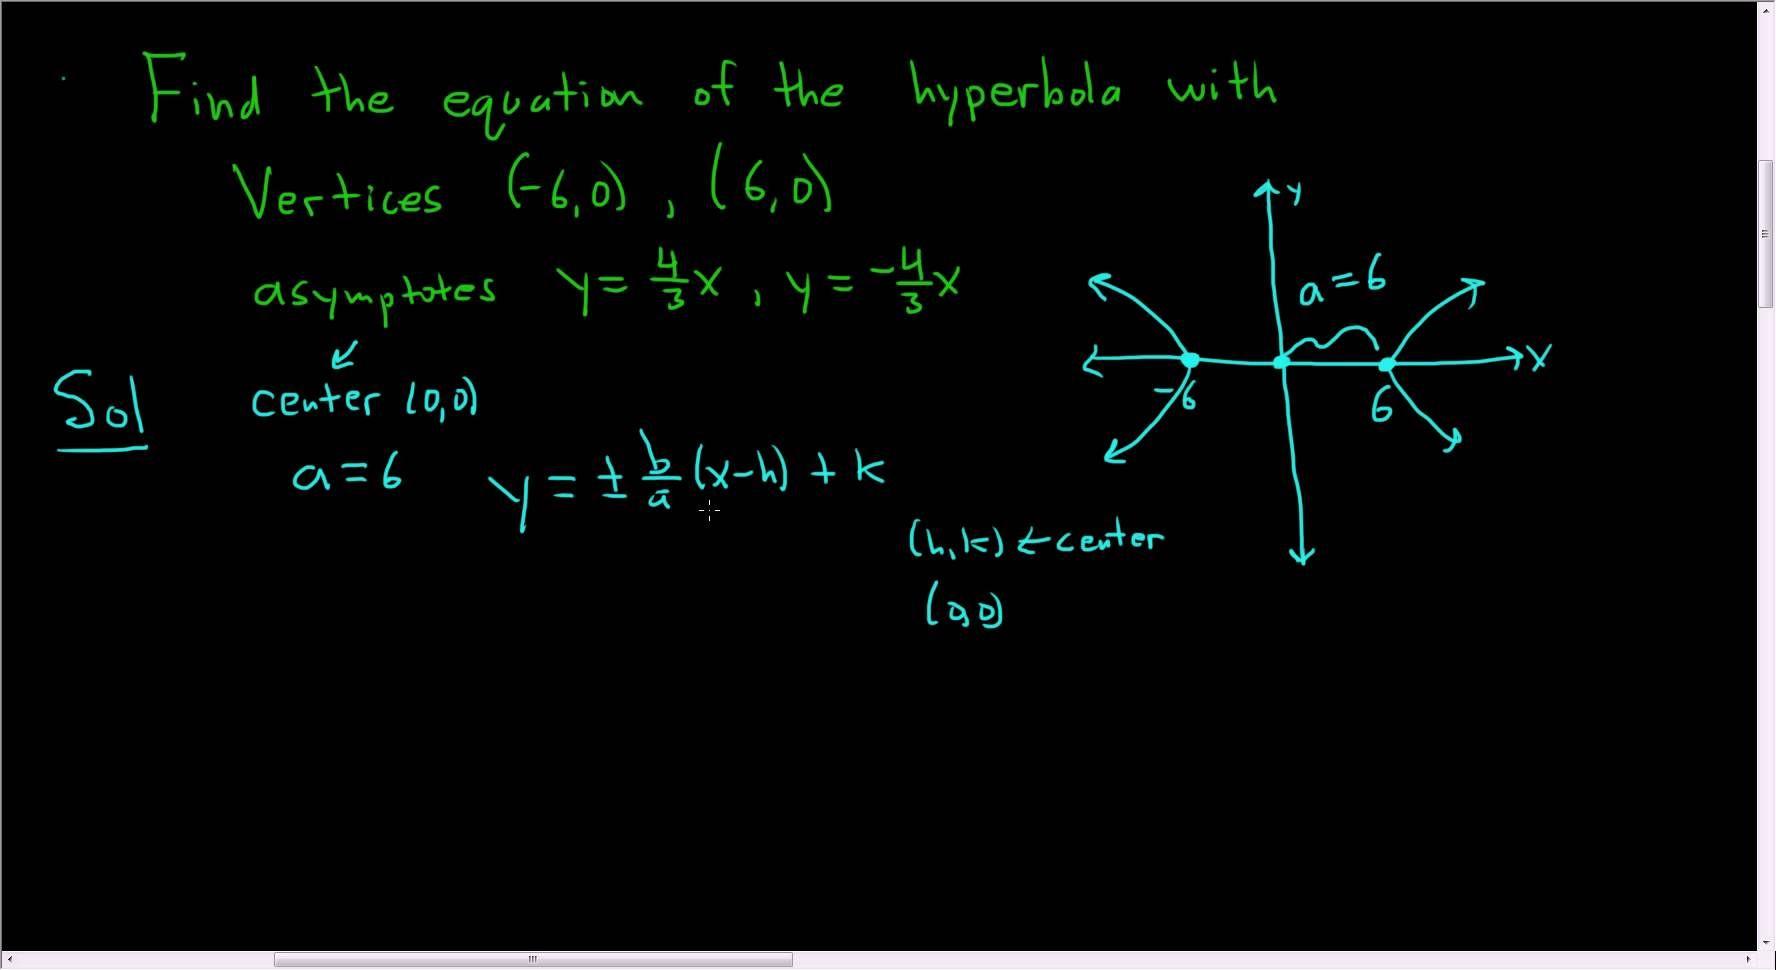 Hyperbola With Vertices 6 0 6 0 And Asymptotes Y 4 3 X Quadratics Math Videos Quadratic Equation